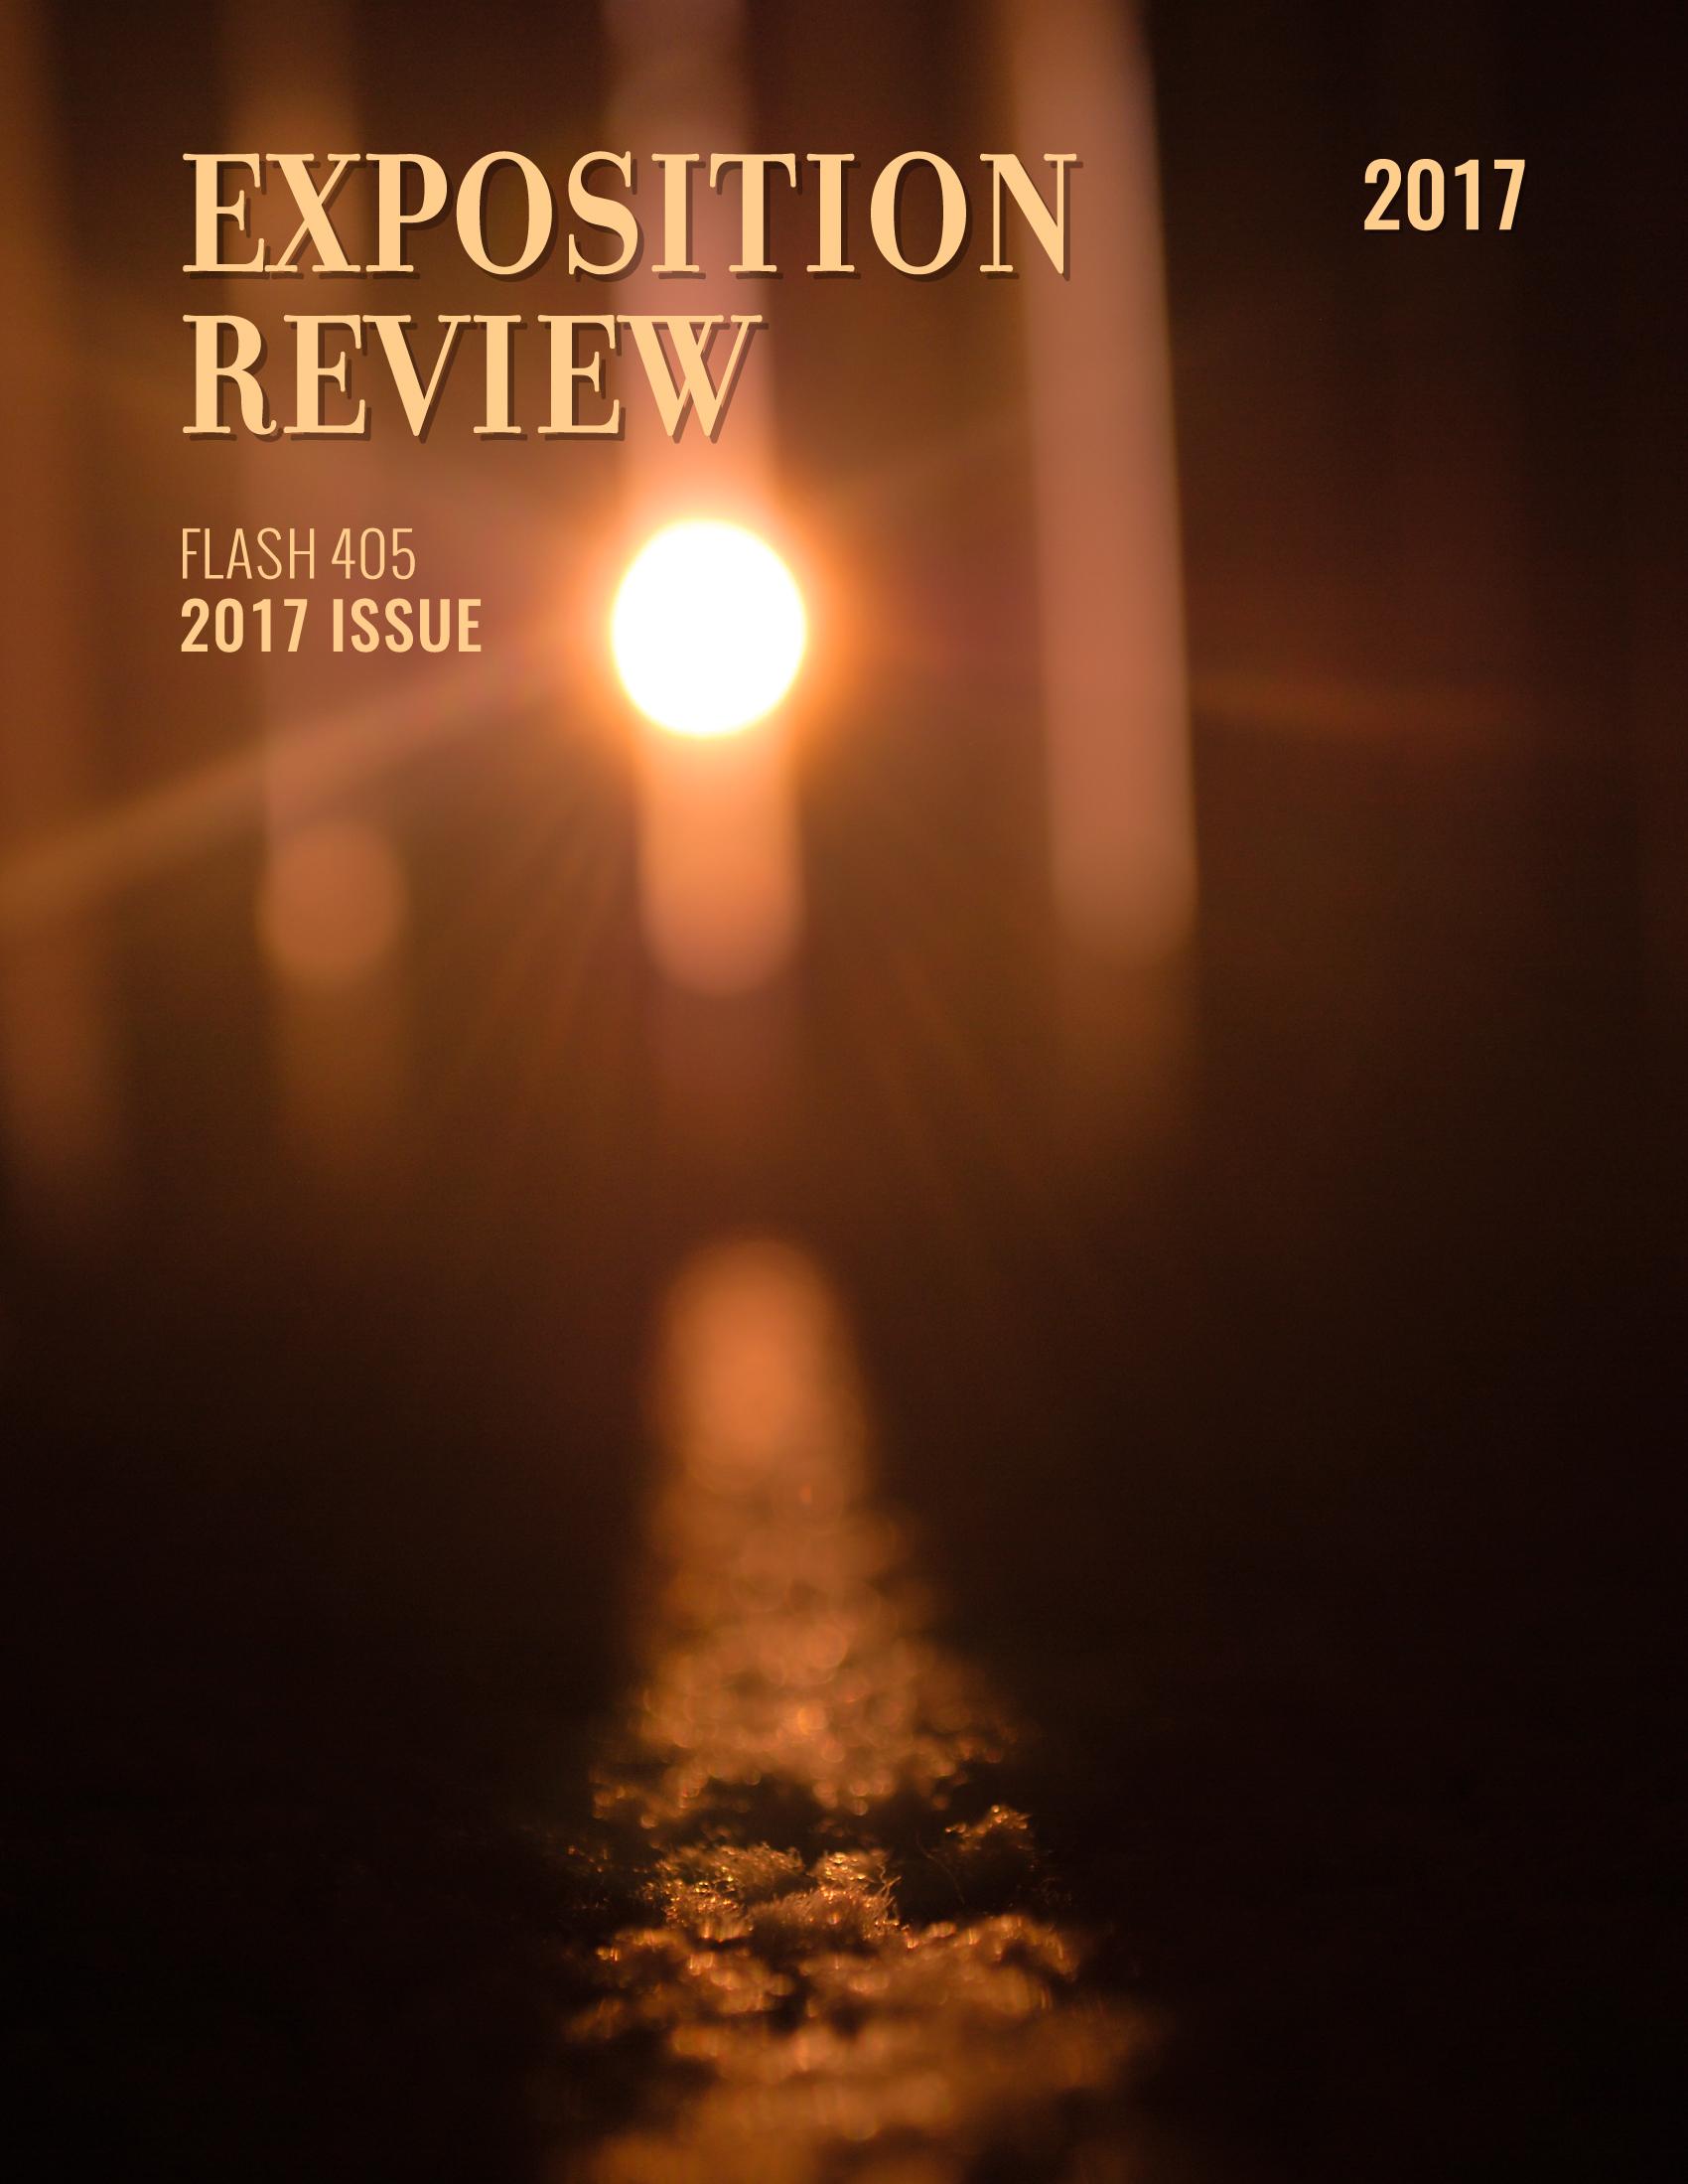 Cover Art Ⓒ Emma Kielgas